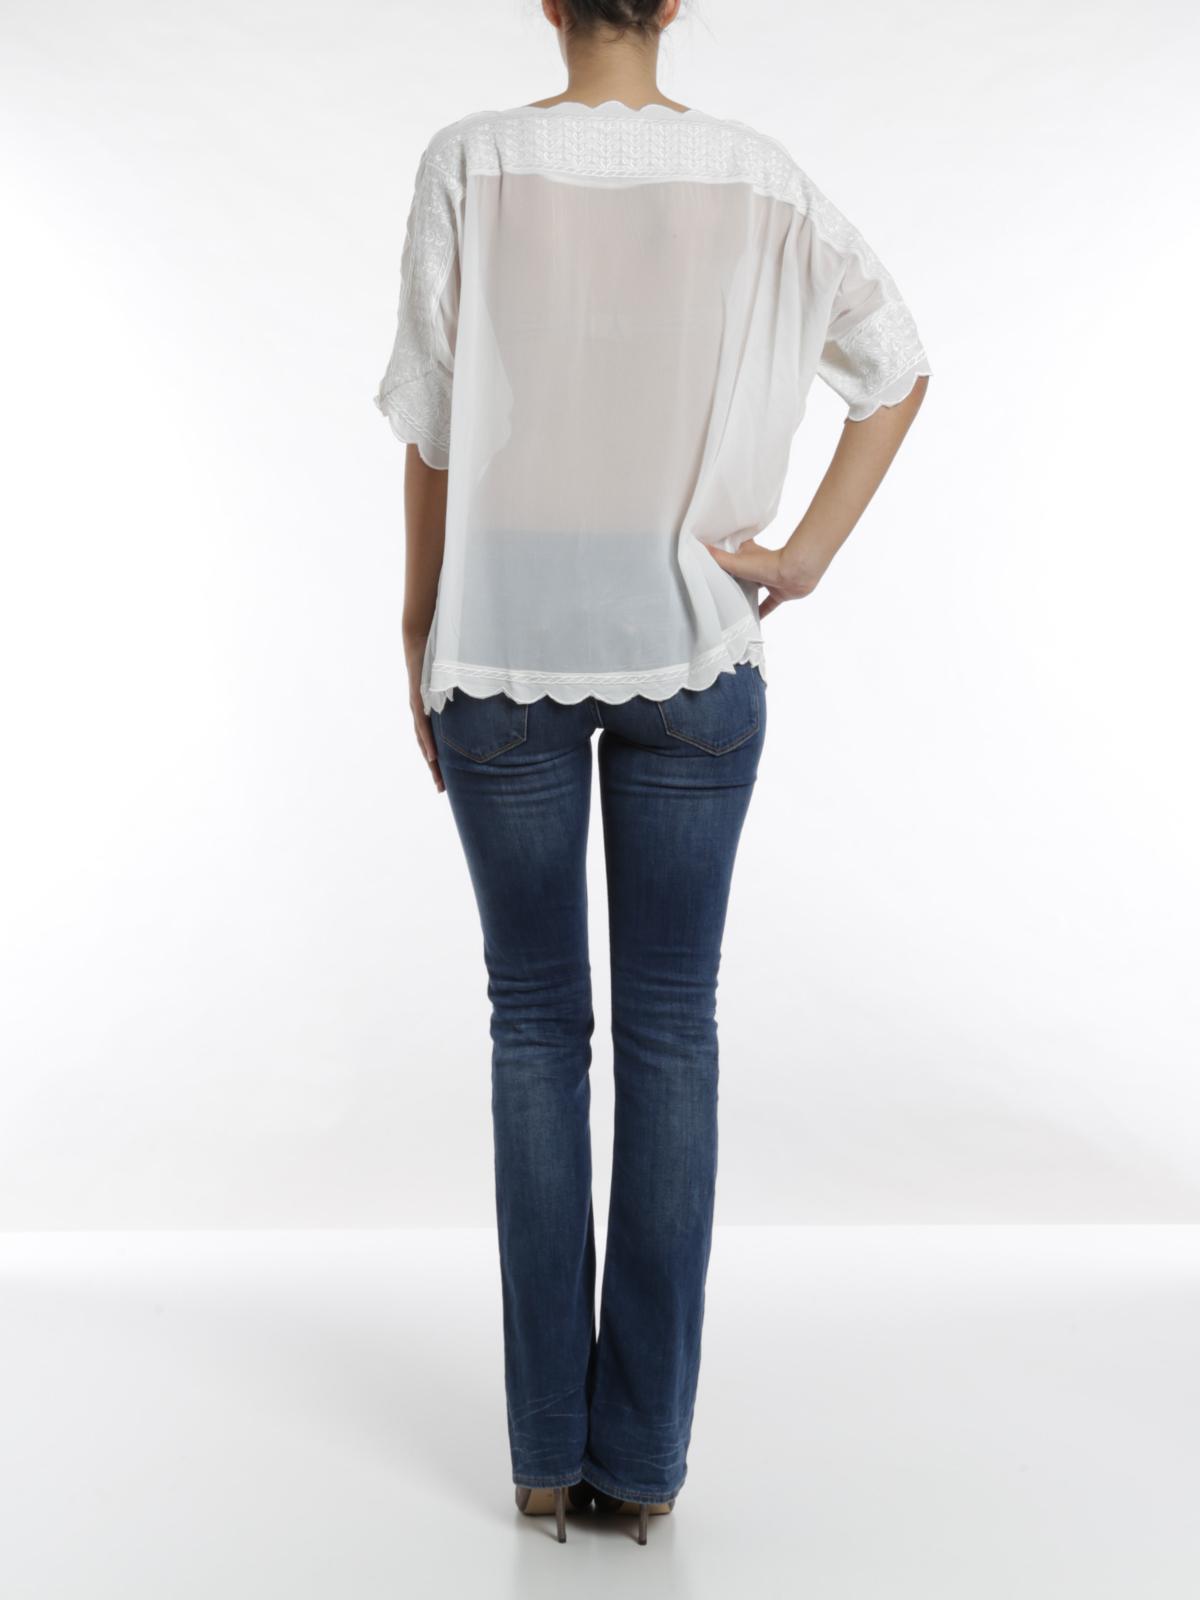 Axel blouse shop online: isabel marant etoile